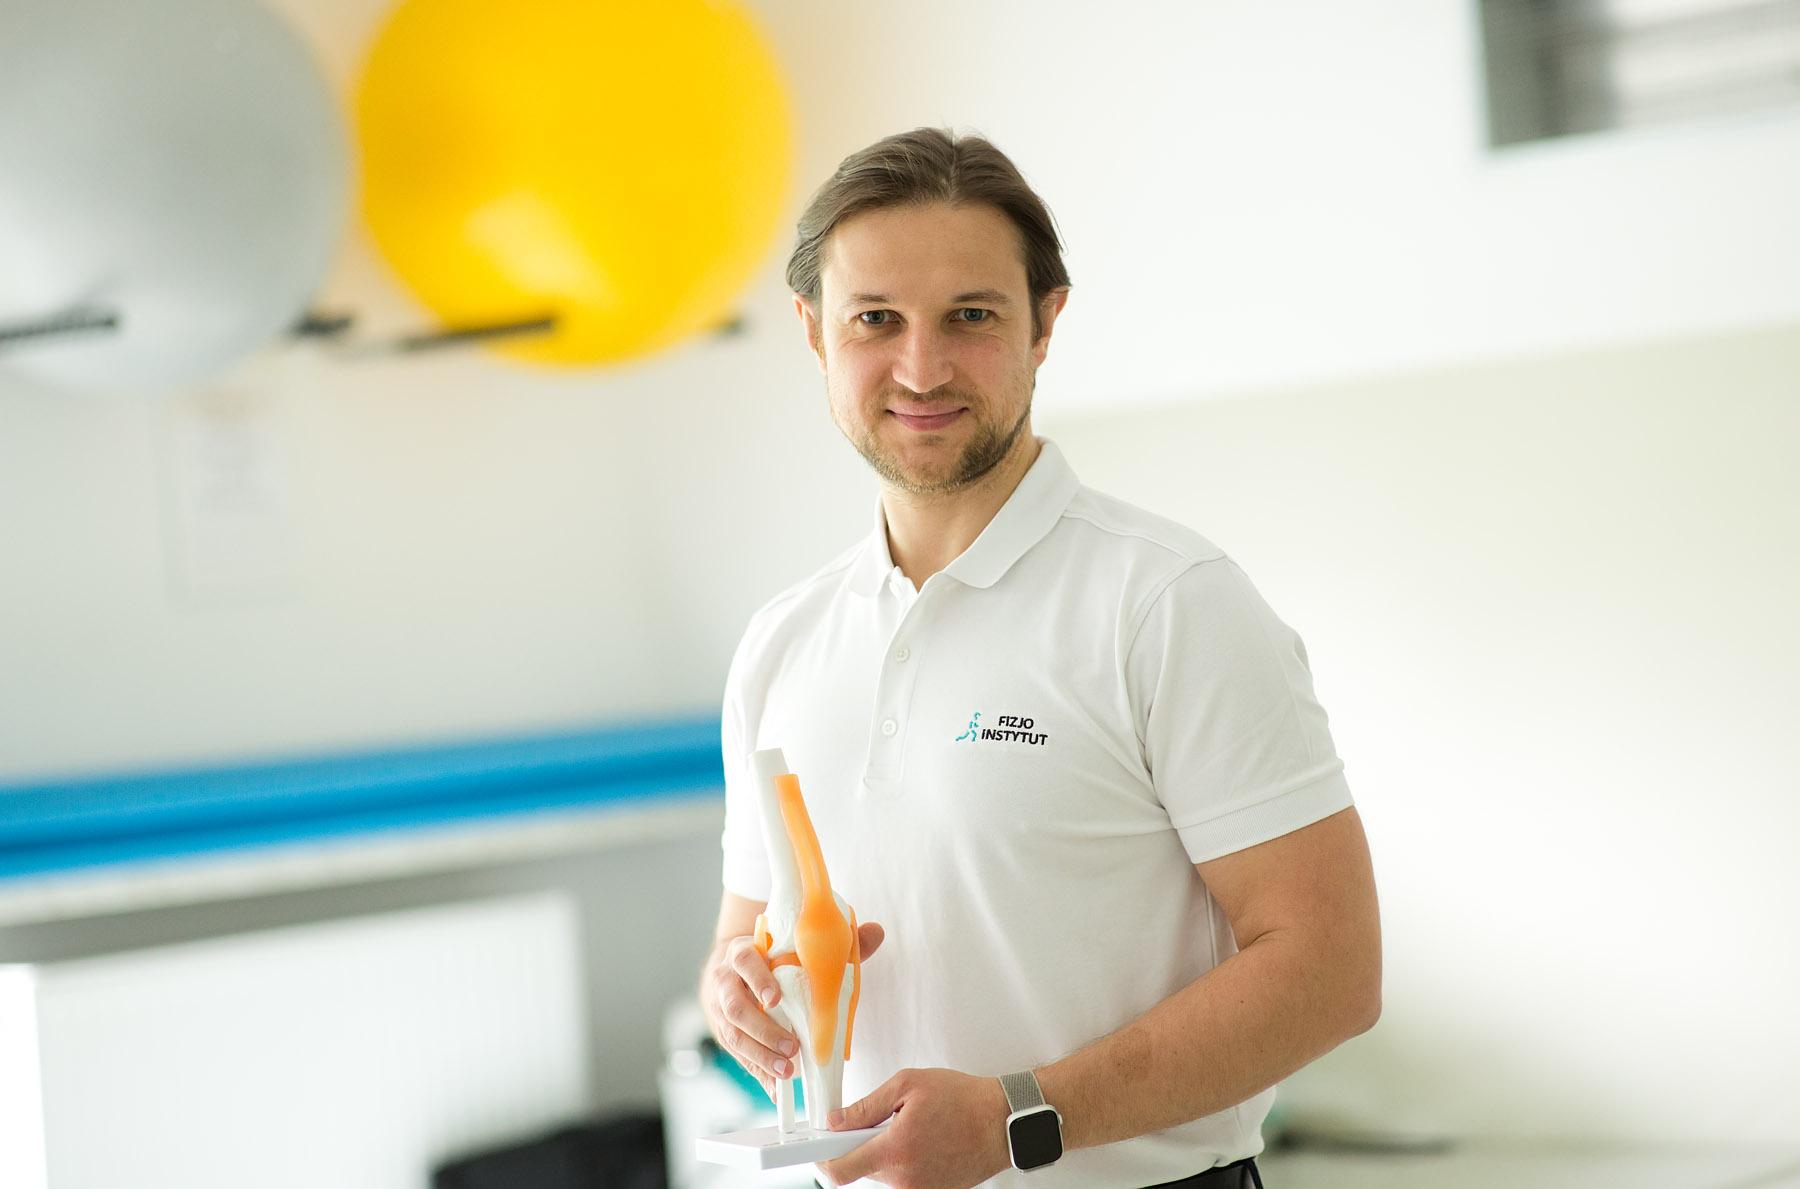 Damian Kapturski